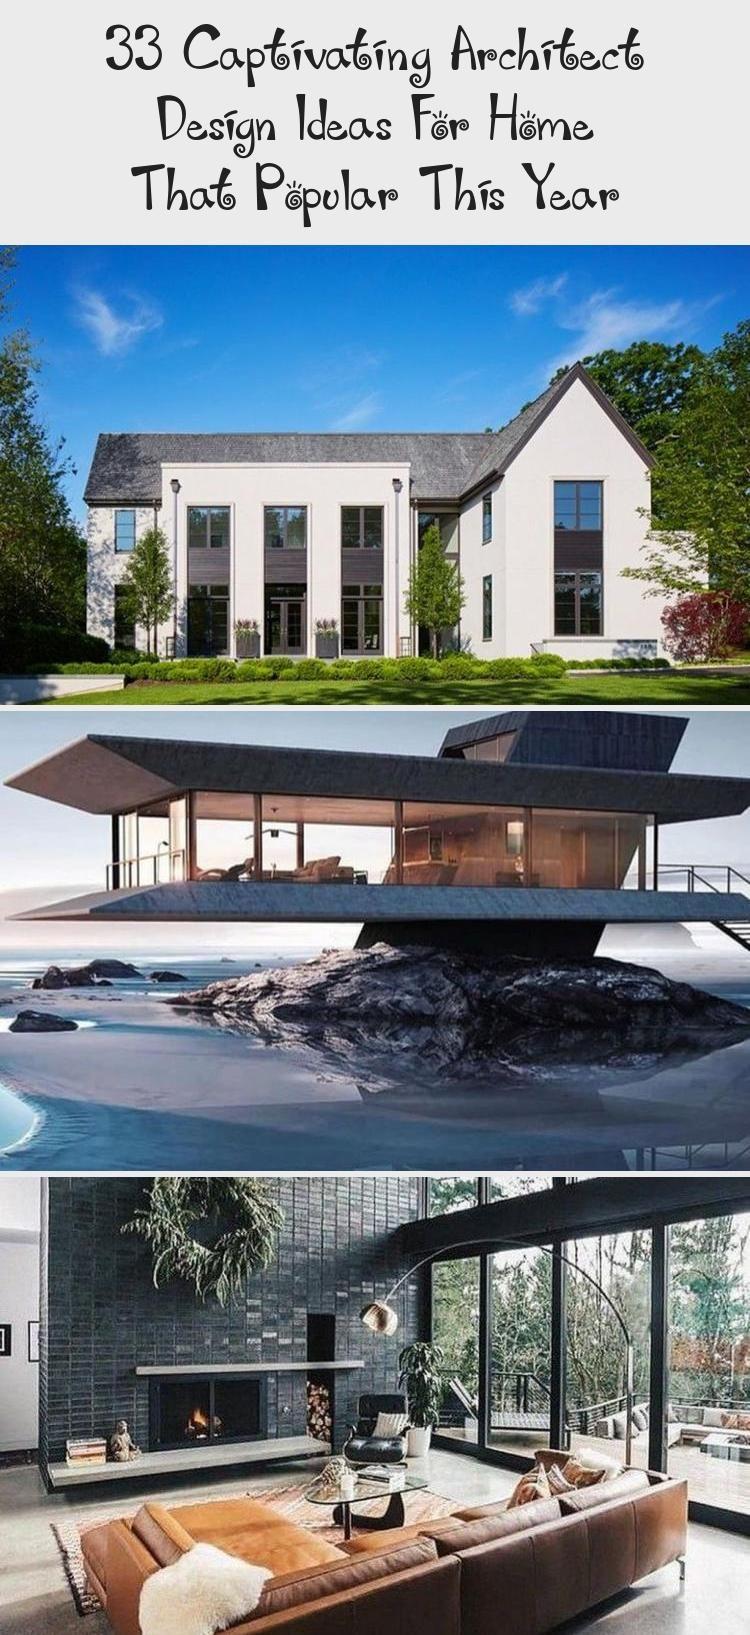 Interior design ideas and inspiration for the transitional home #gorgeousgrey #interiordesign #greatindoors #interiordesignOffice #interiordesignInteriorismo #interiordesignLayout #interiordesignClassic #Houseinteriordesign